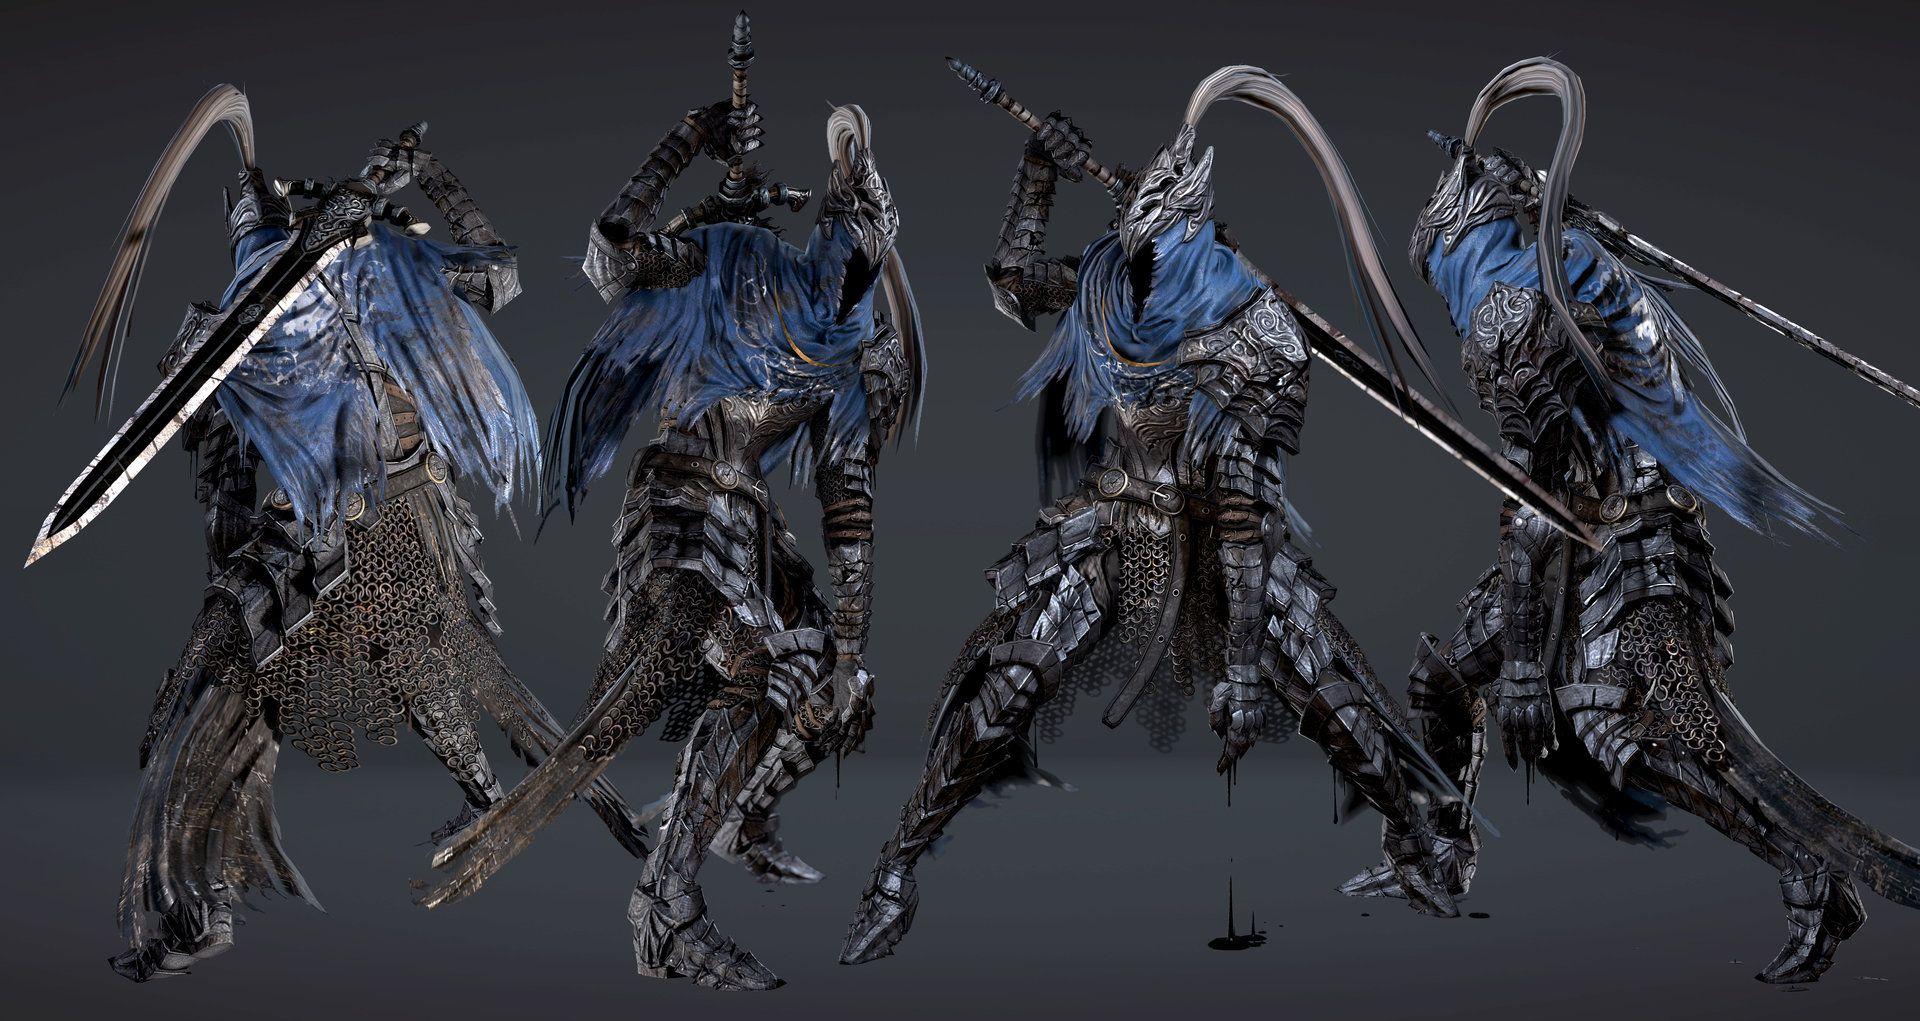 ArtStation - Dark souls - Artorias, chang-gon shin | Armors